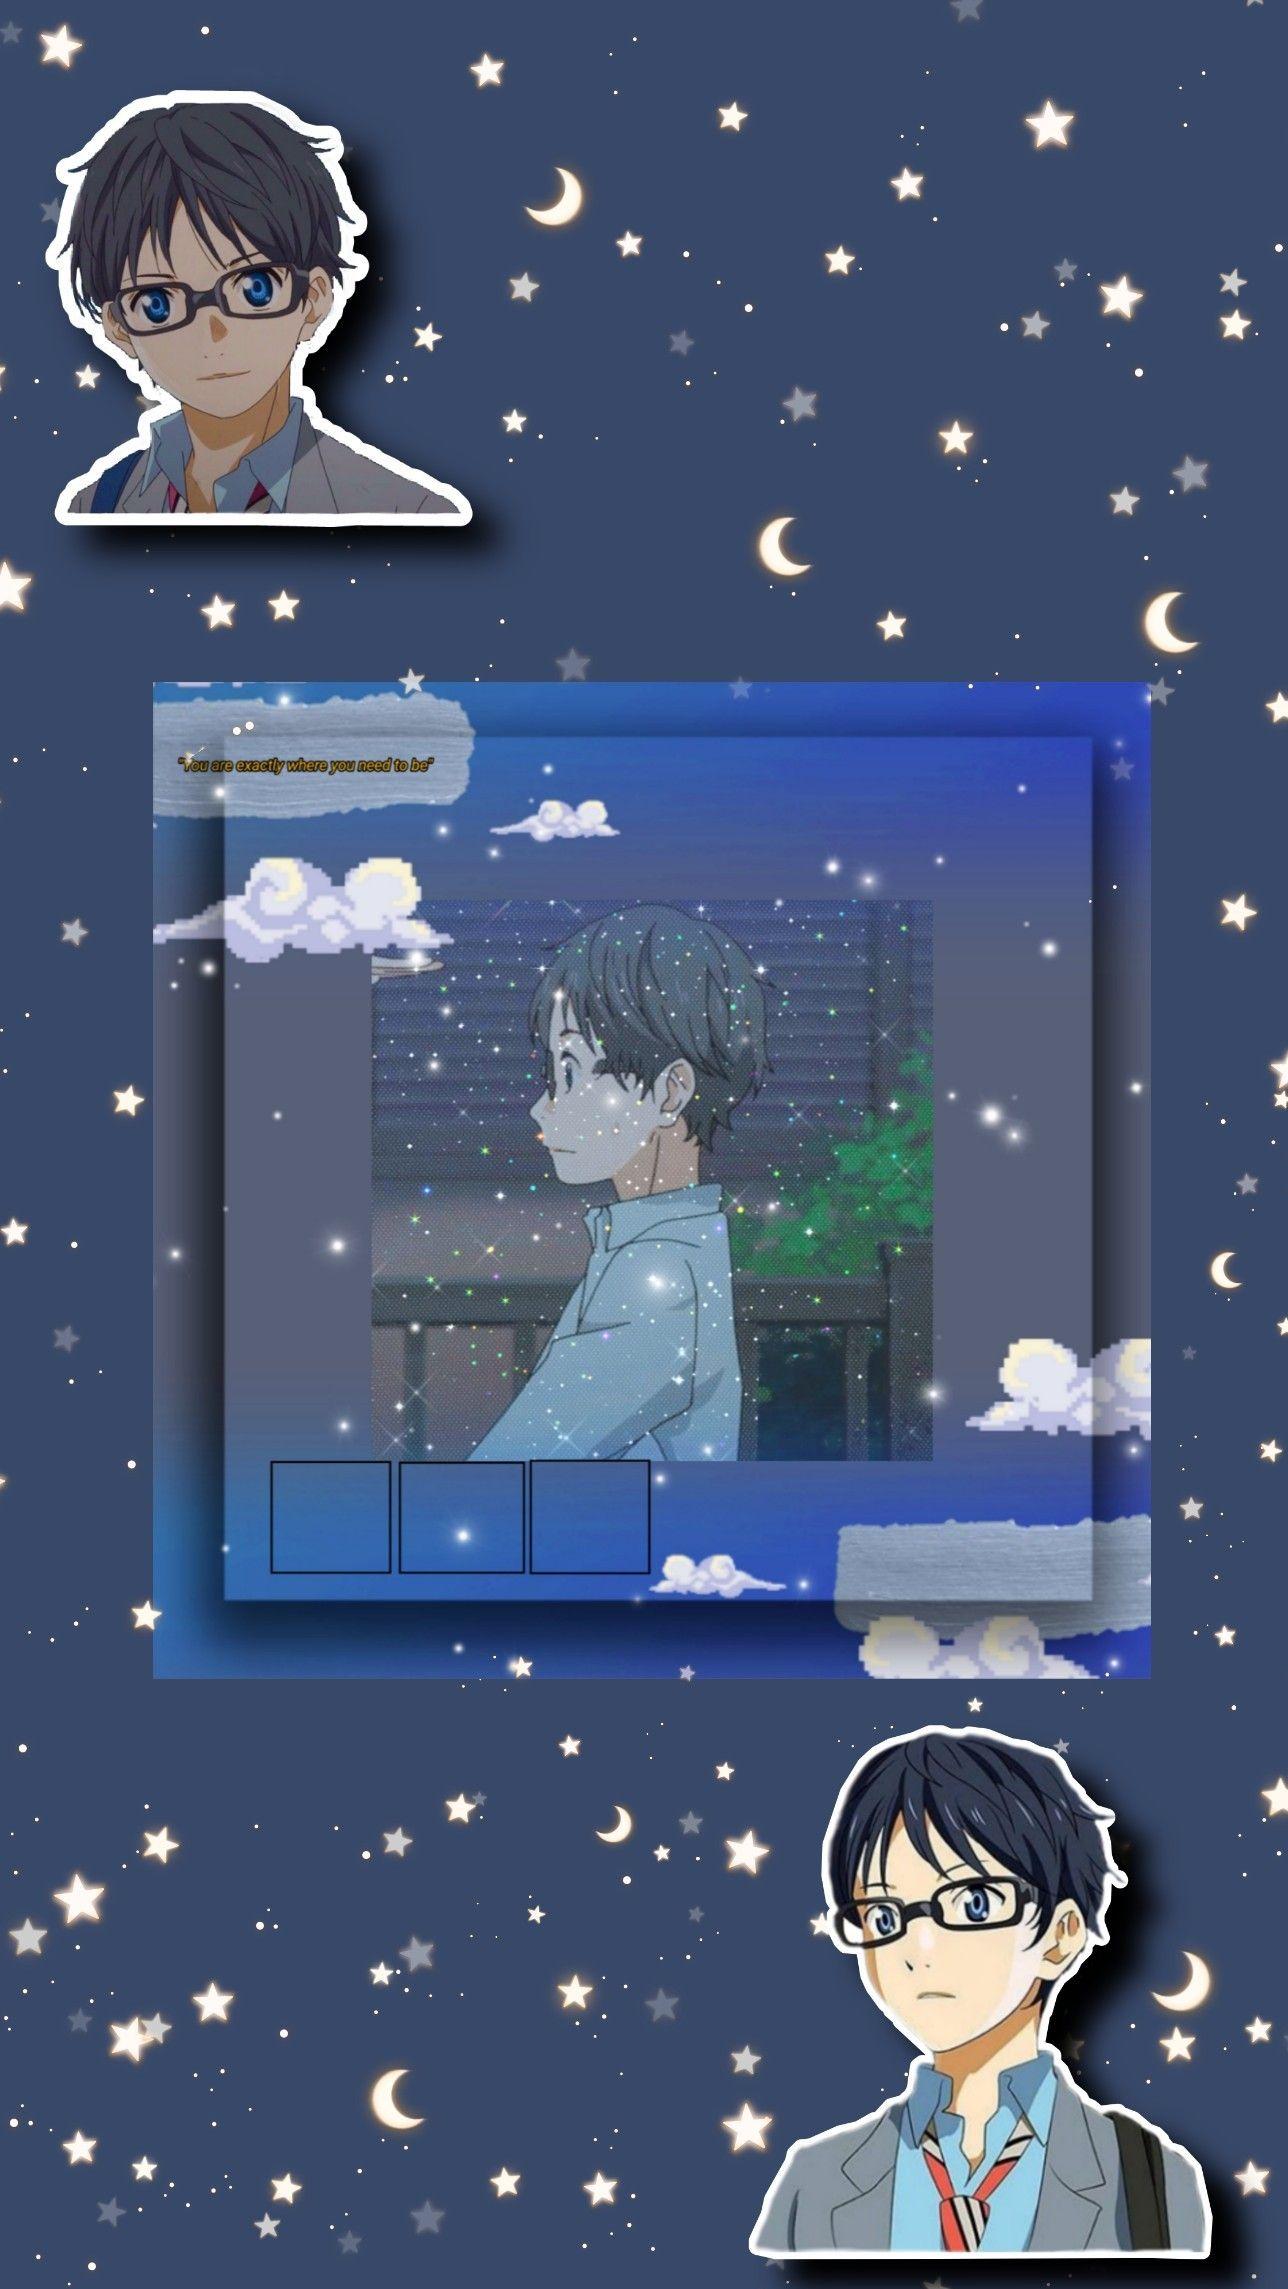 Your Lie In April Shigatsu Wa Kimi No Uso Match Icon Wallpaper Kousei Arima Your Lie In April Wallpaper You Lied Aesthetic anime wallpaper your lie in